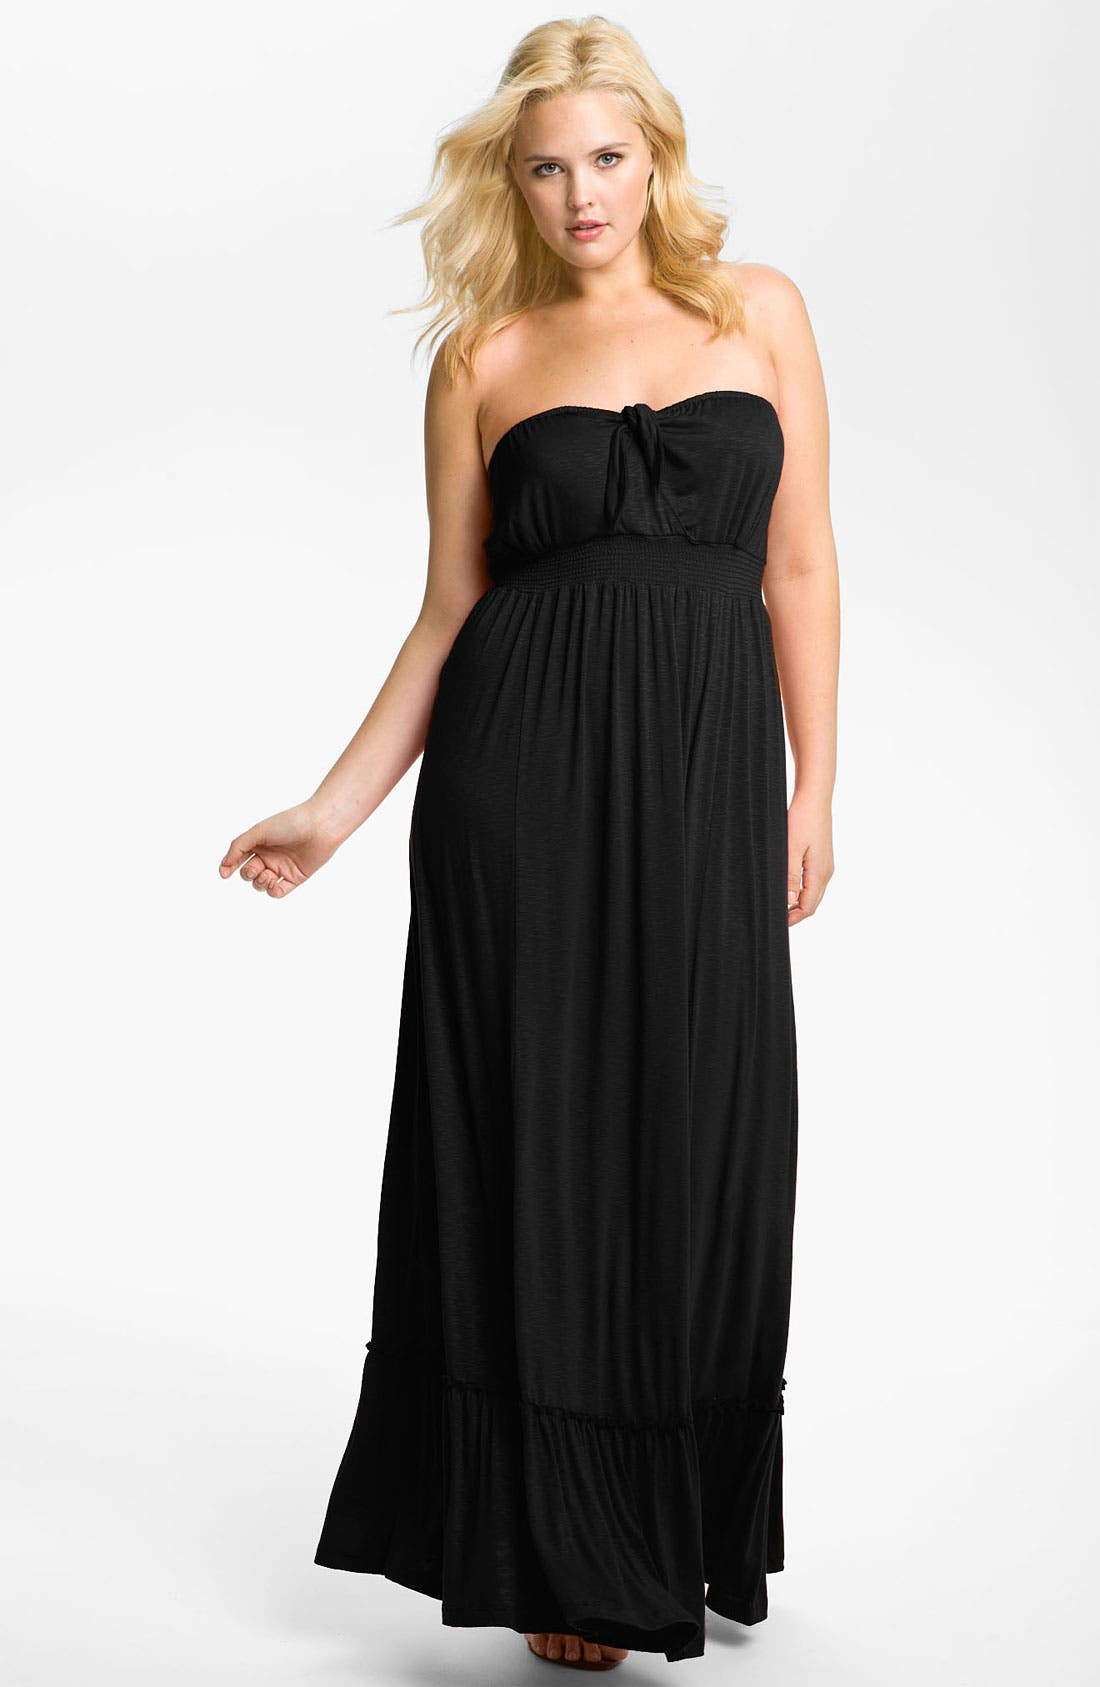 Alternate Image 1 Selected - Bellatrix Strapless Maxi Dress (Plus)